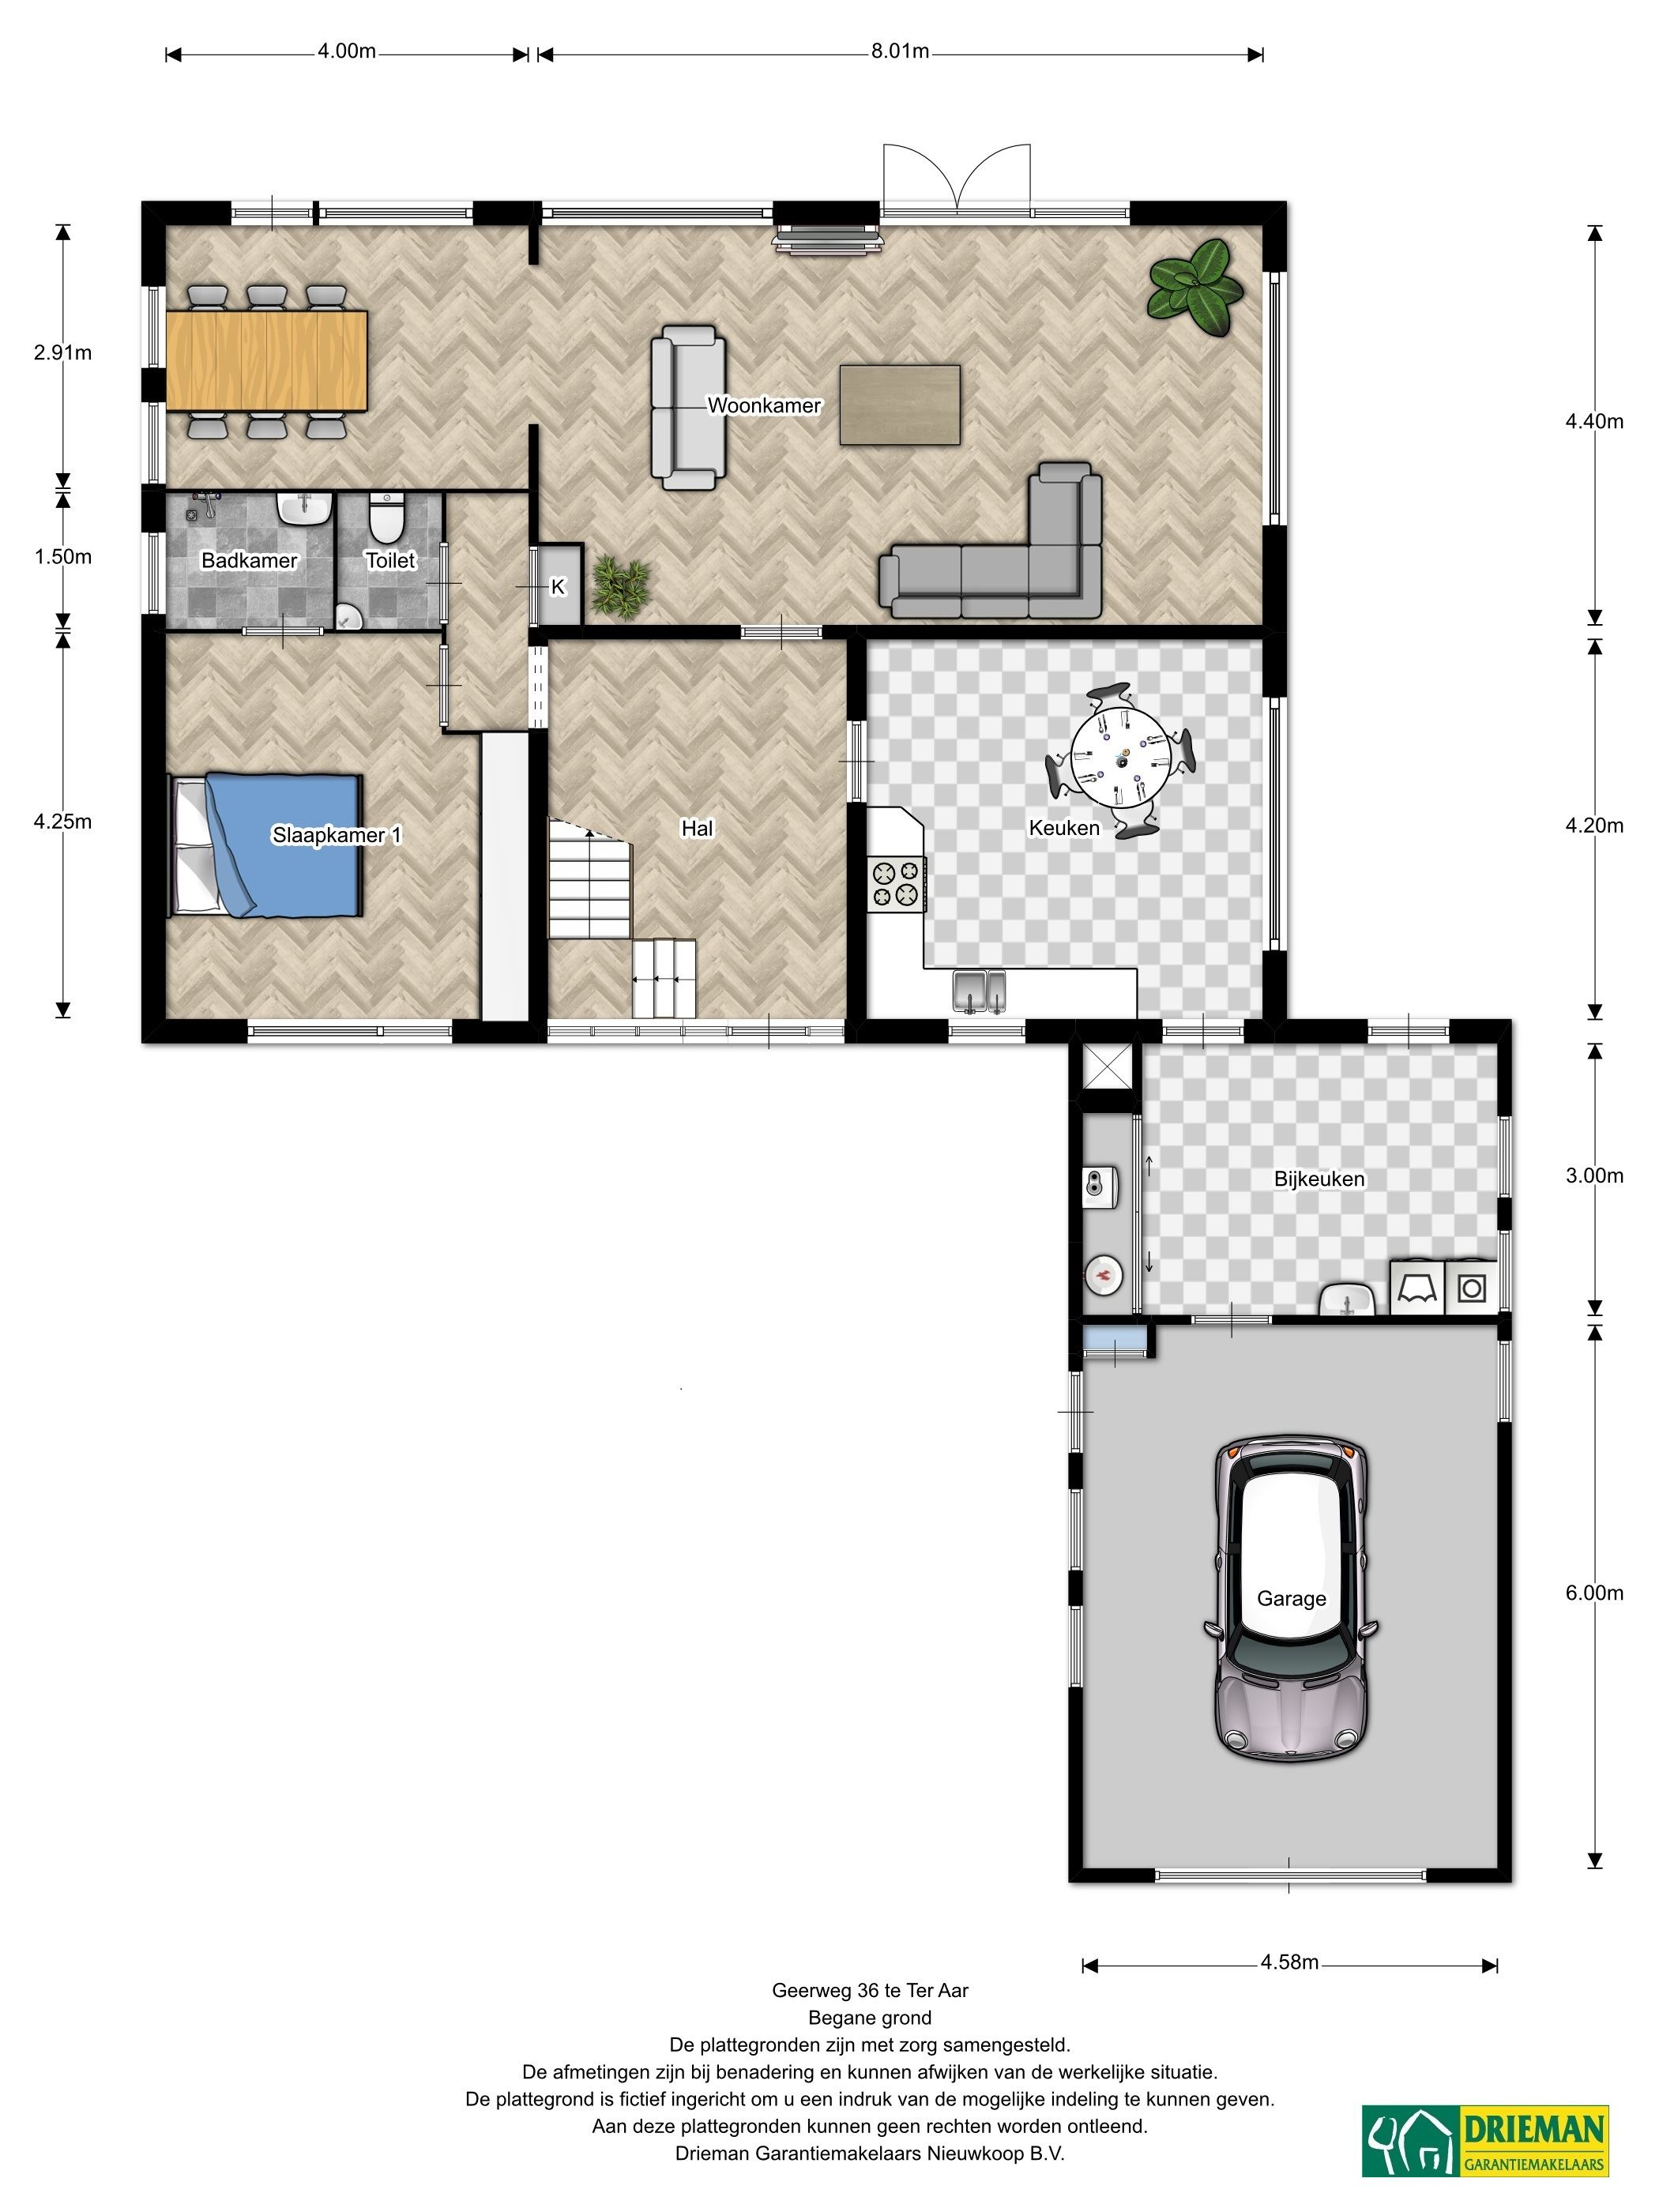 Best Afmetingen Woonkamer Photos - Home Ideas Design - commonsdev.us